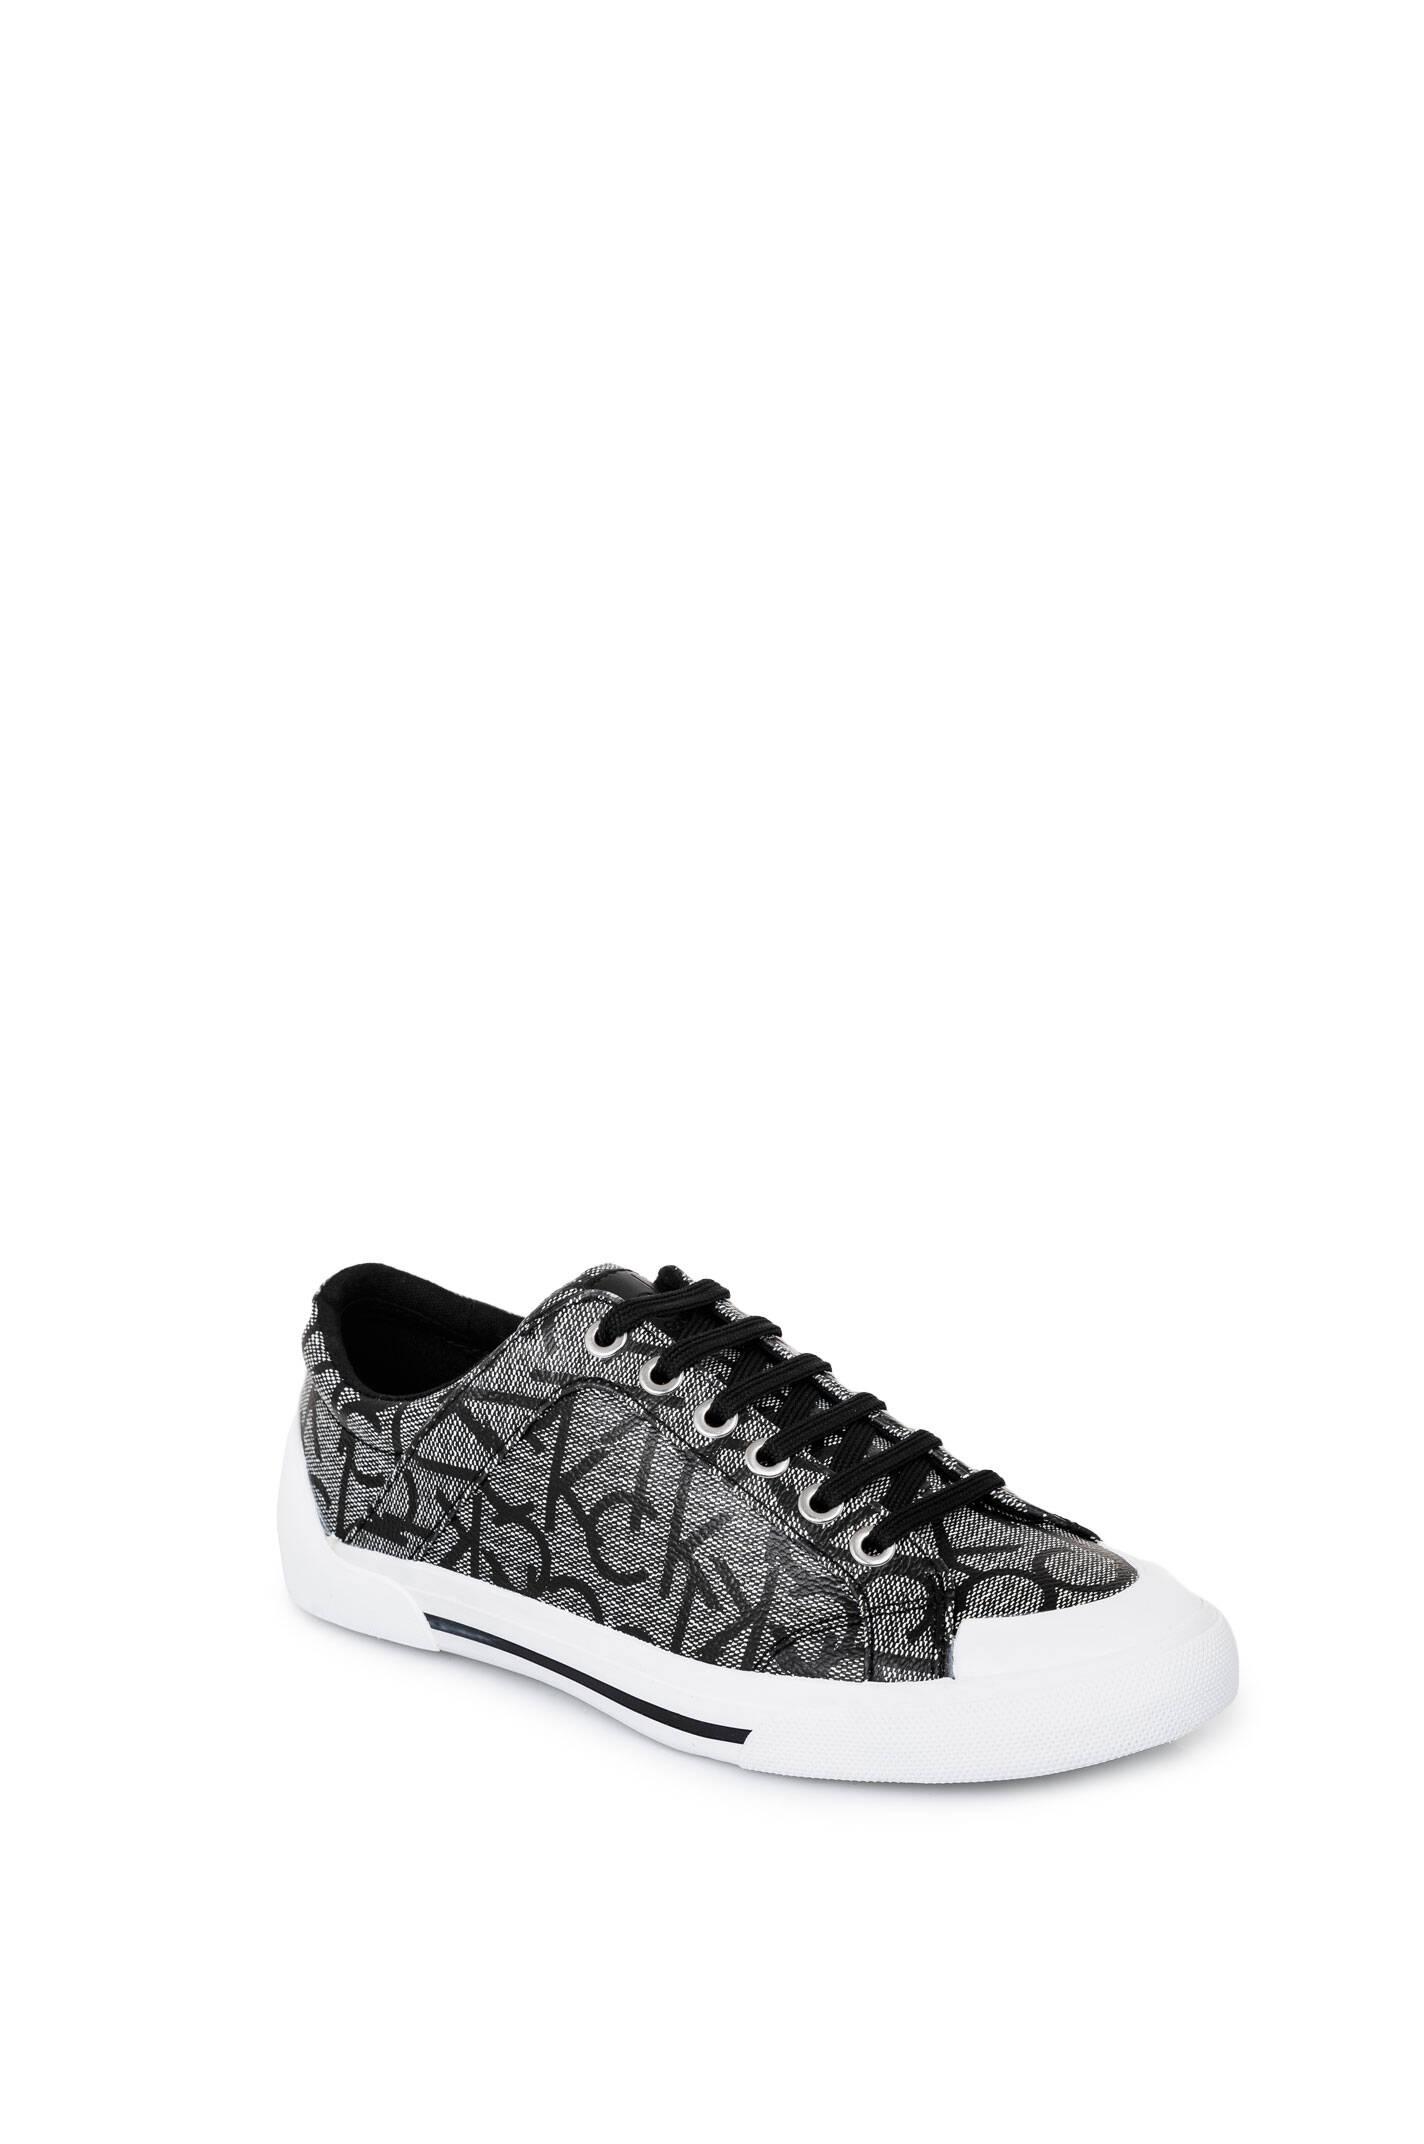 92474aa823 Giselle Sneakers Calvin Klein Jeans